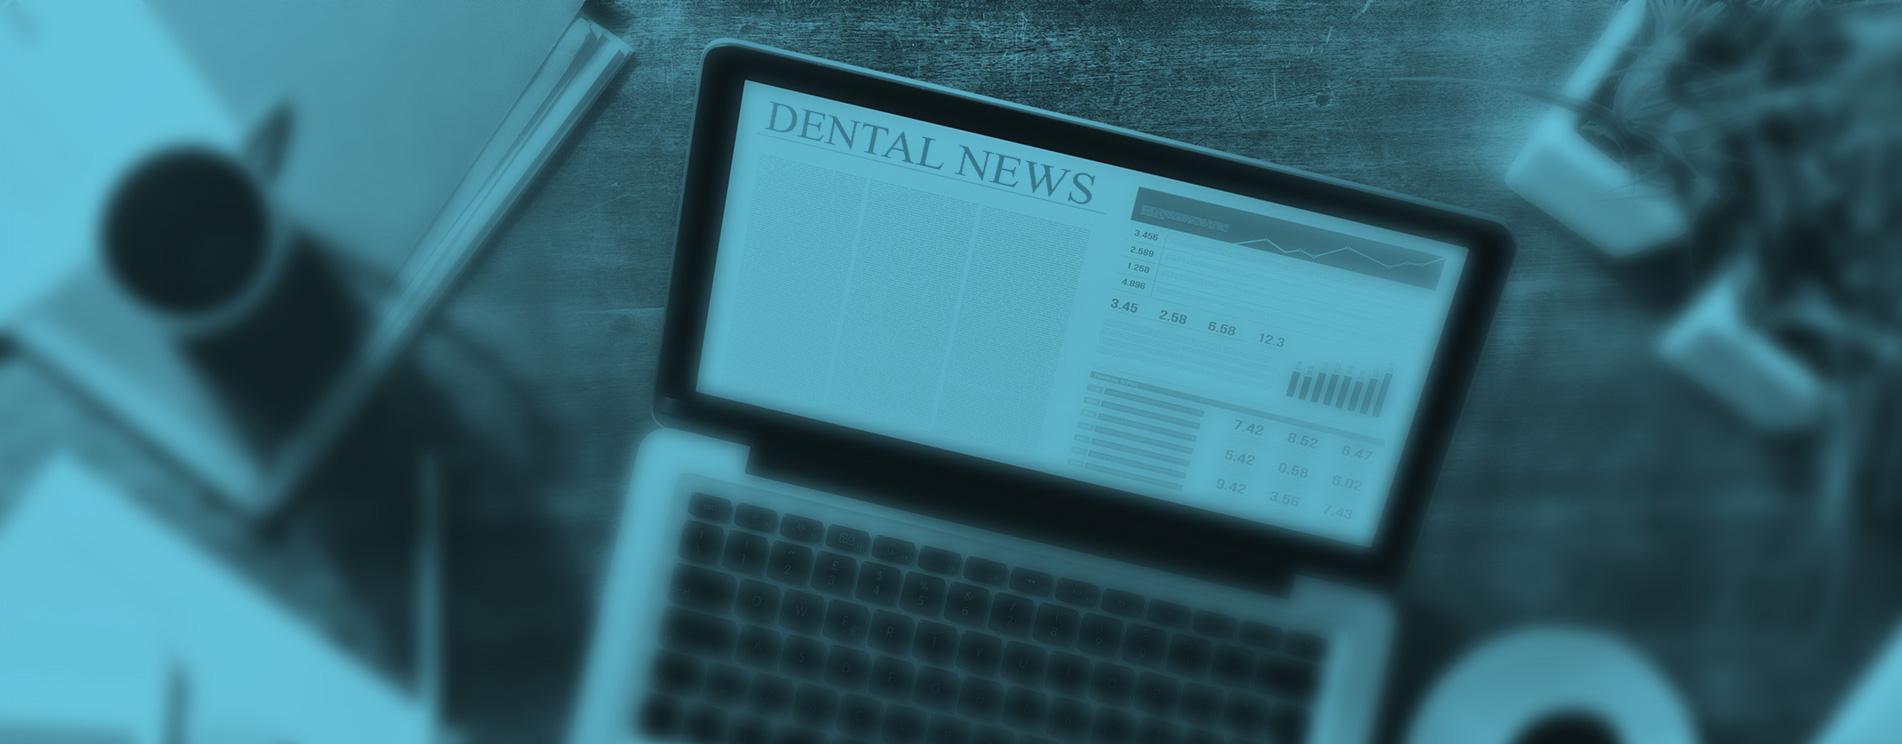 our_news_header2